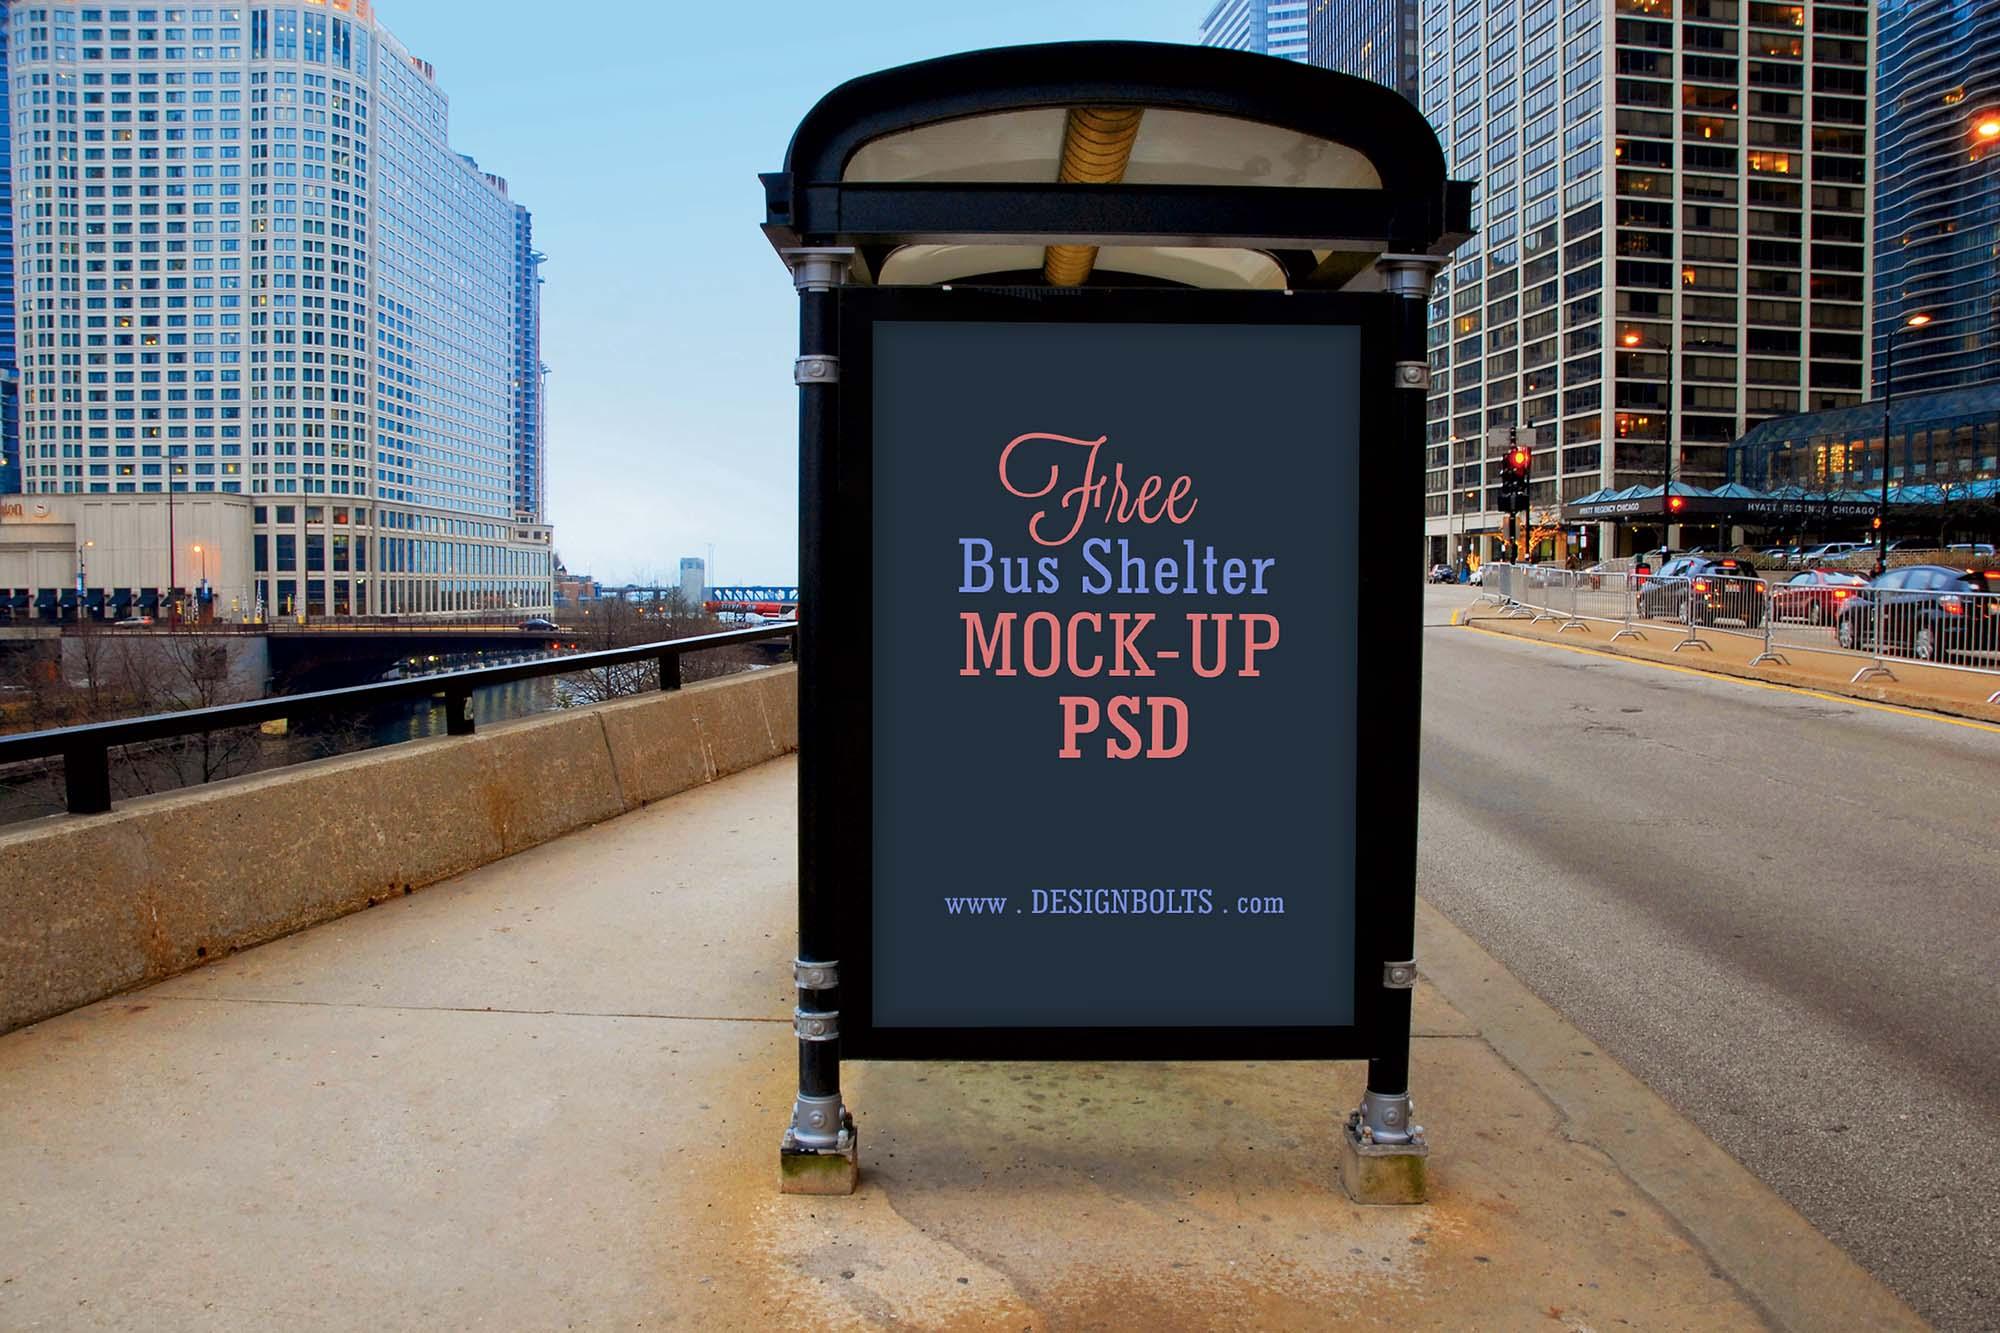 Bus Shelter Advertising Mockup 2